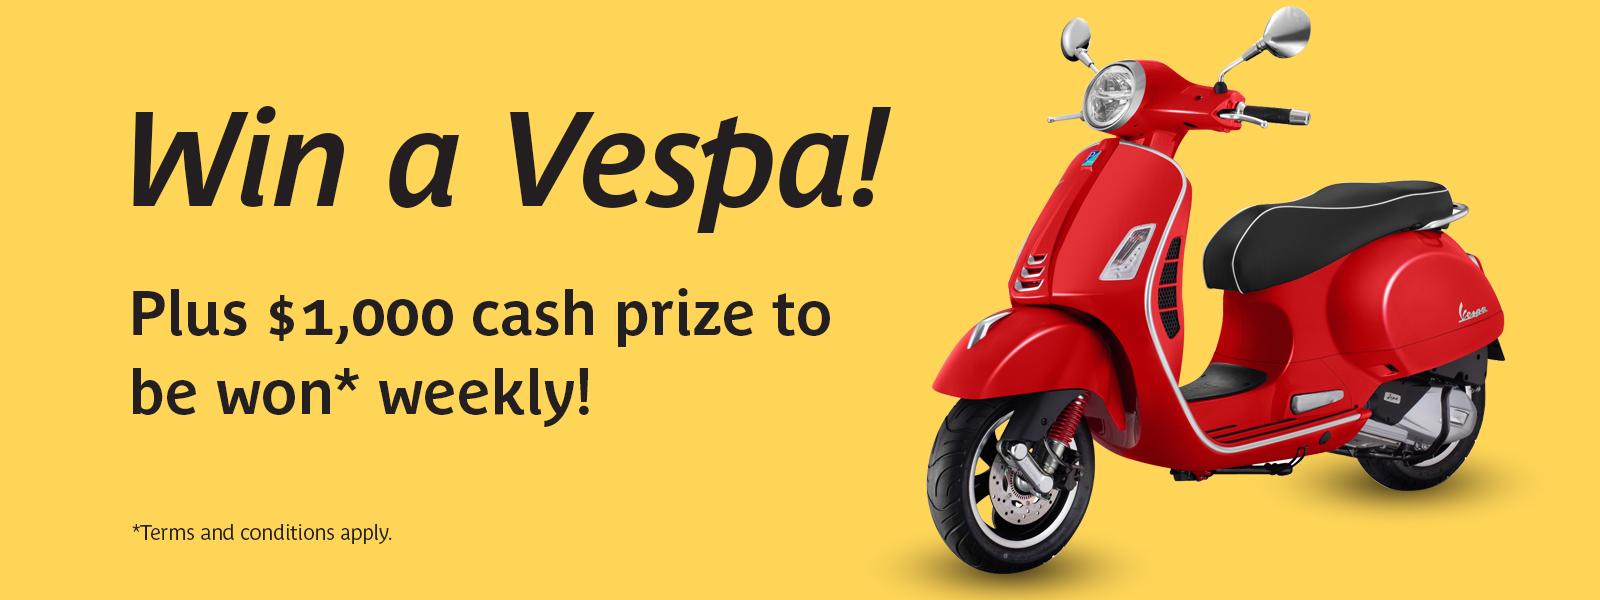 Win a Vespa Competition Banner